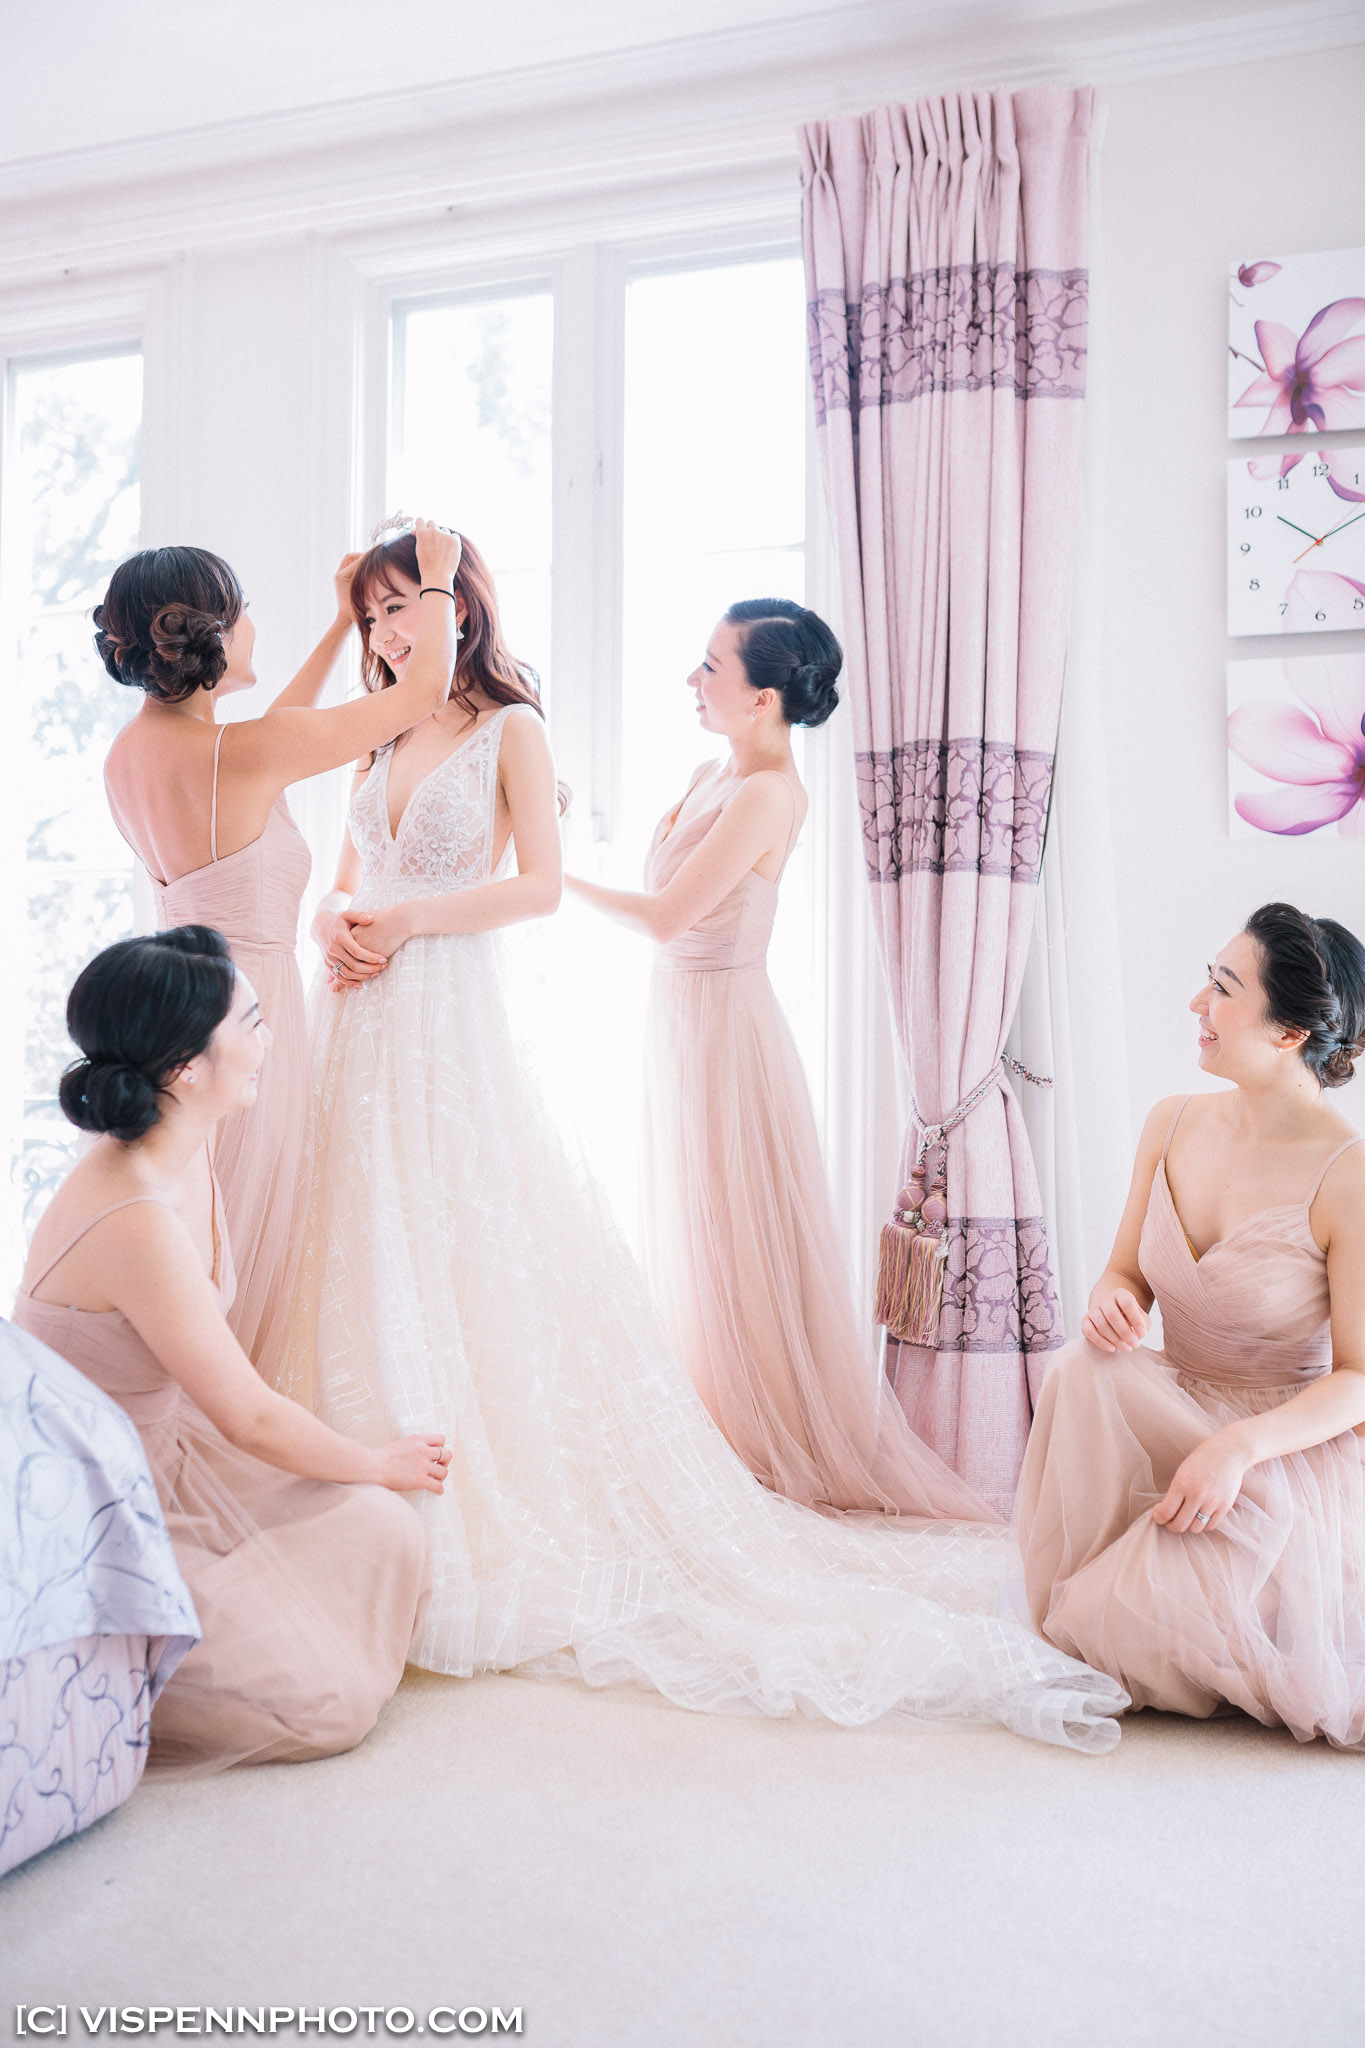 WEDDING DAY Photography Melbourne ZHPENN 0043 5D2 0540